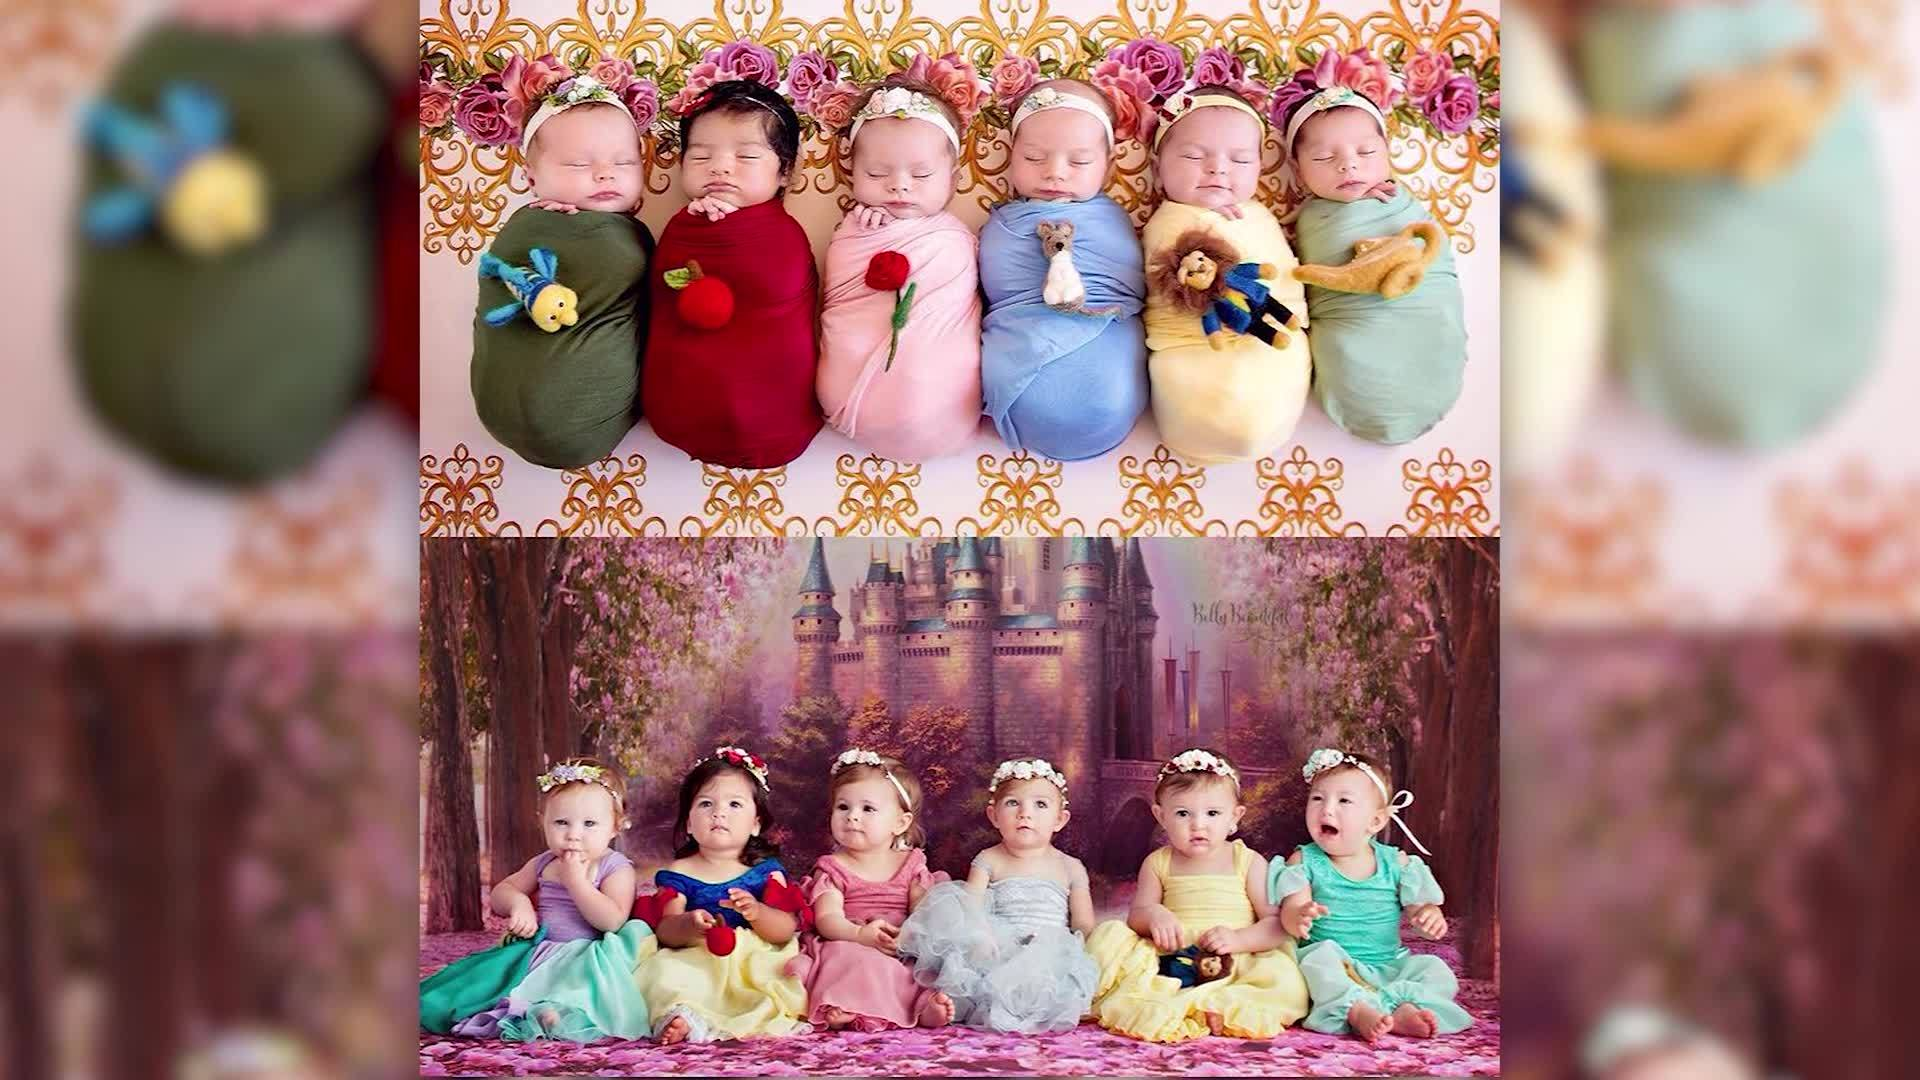 Photographer reunites Disney princess newborns 1 year later